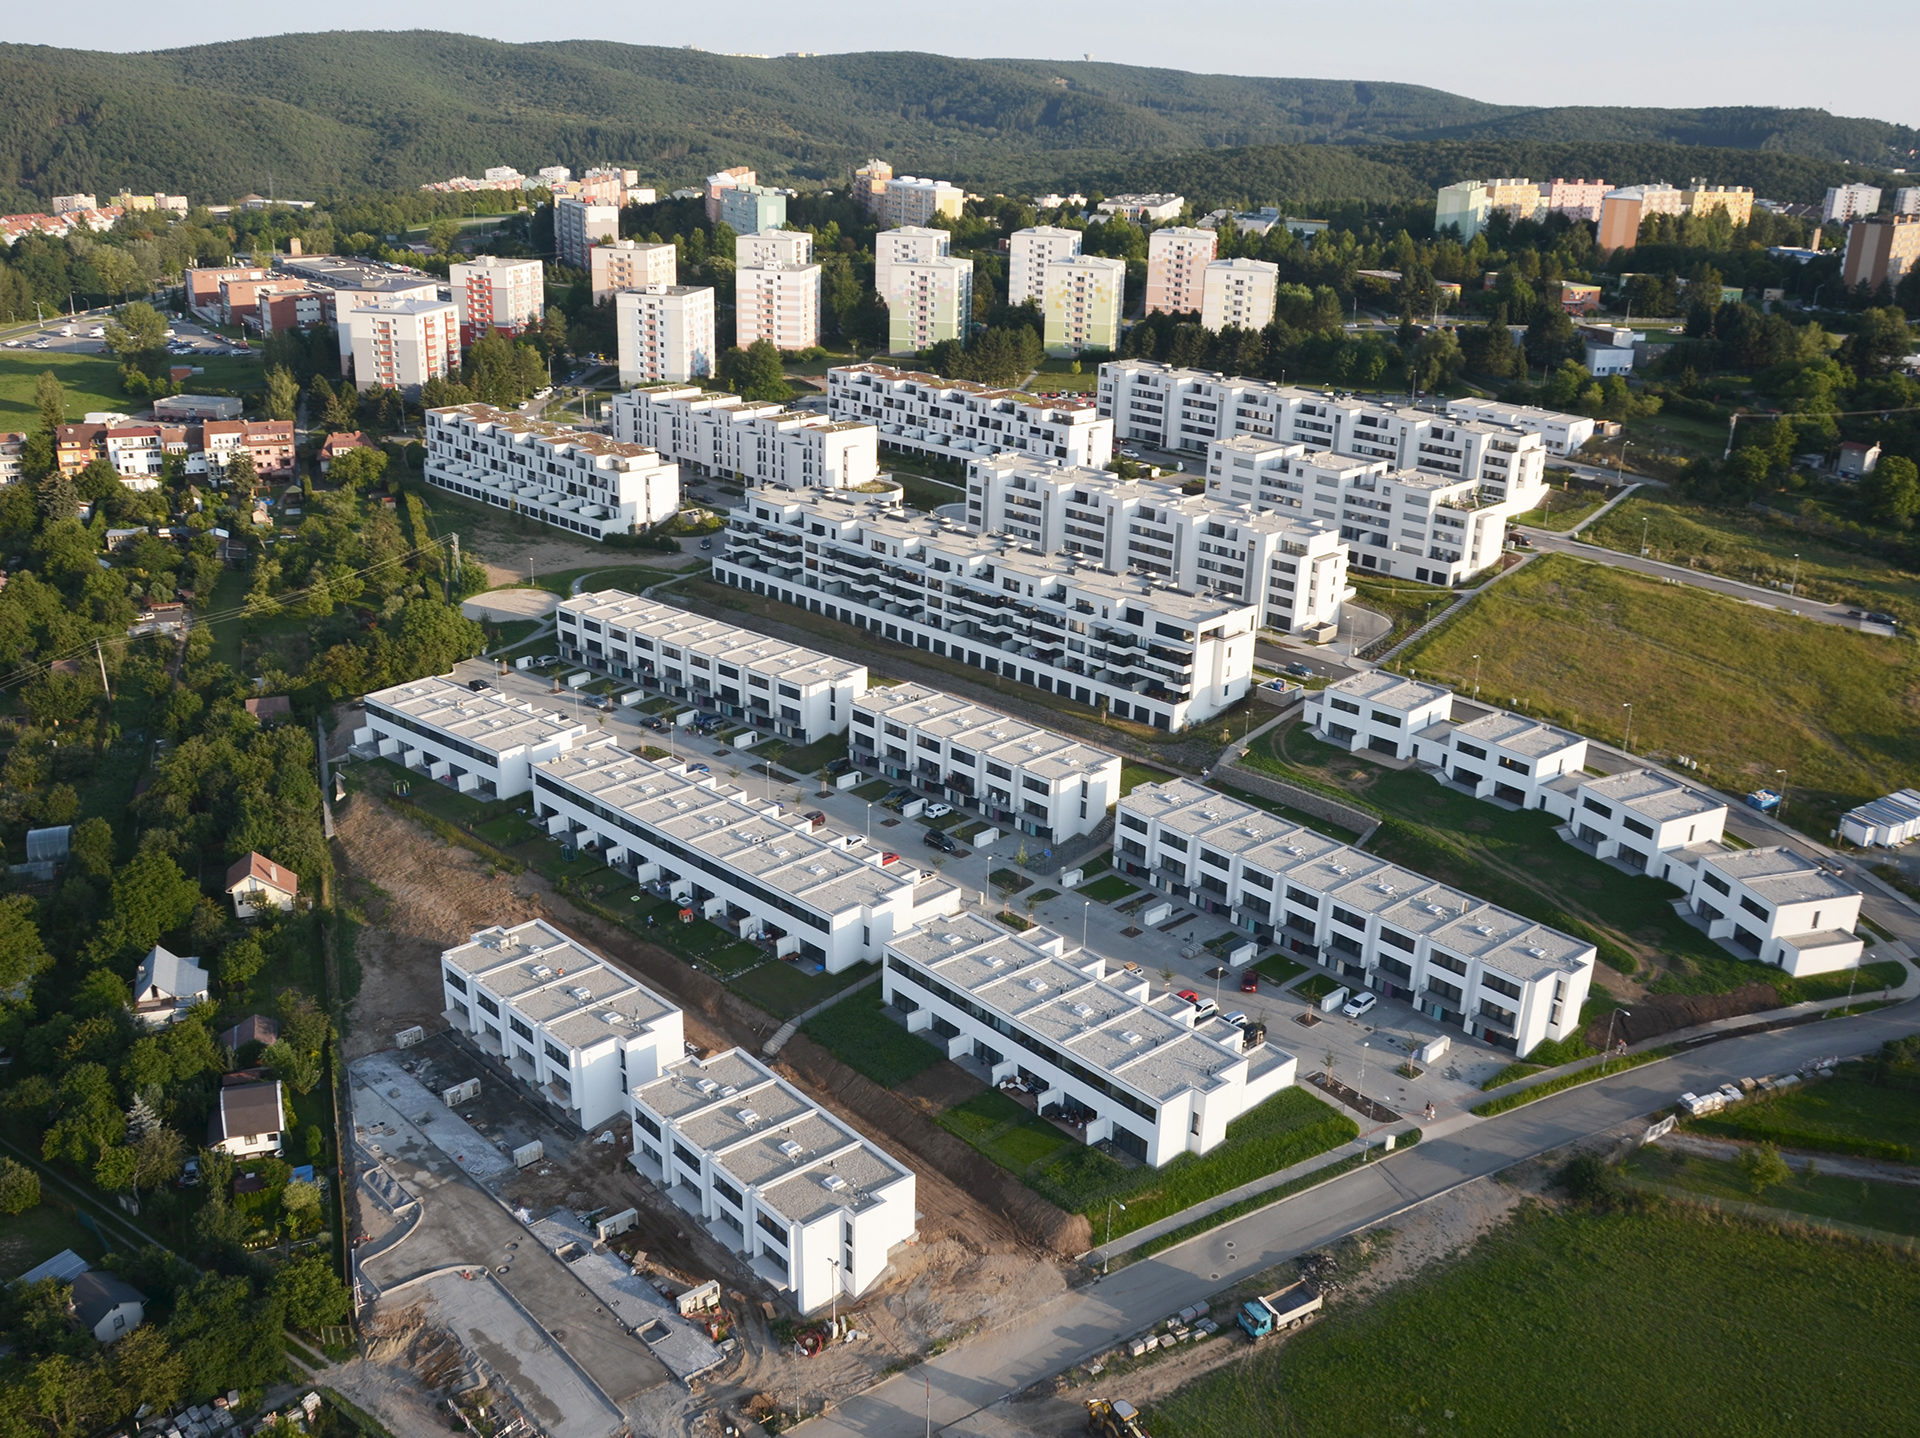 Housing Units Panorama, Brno